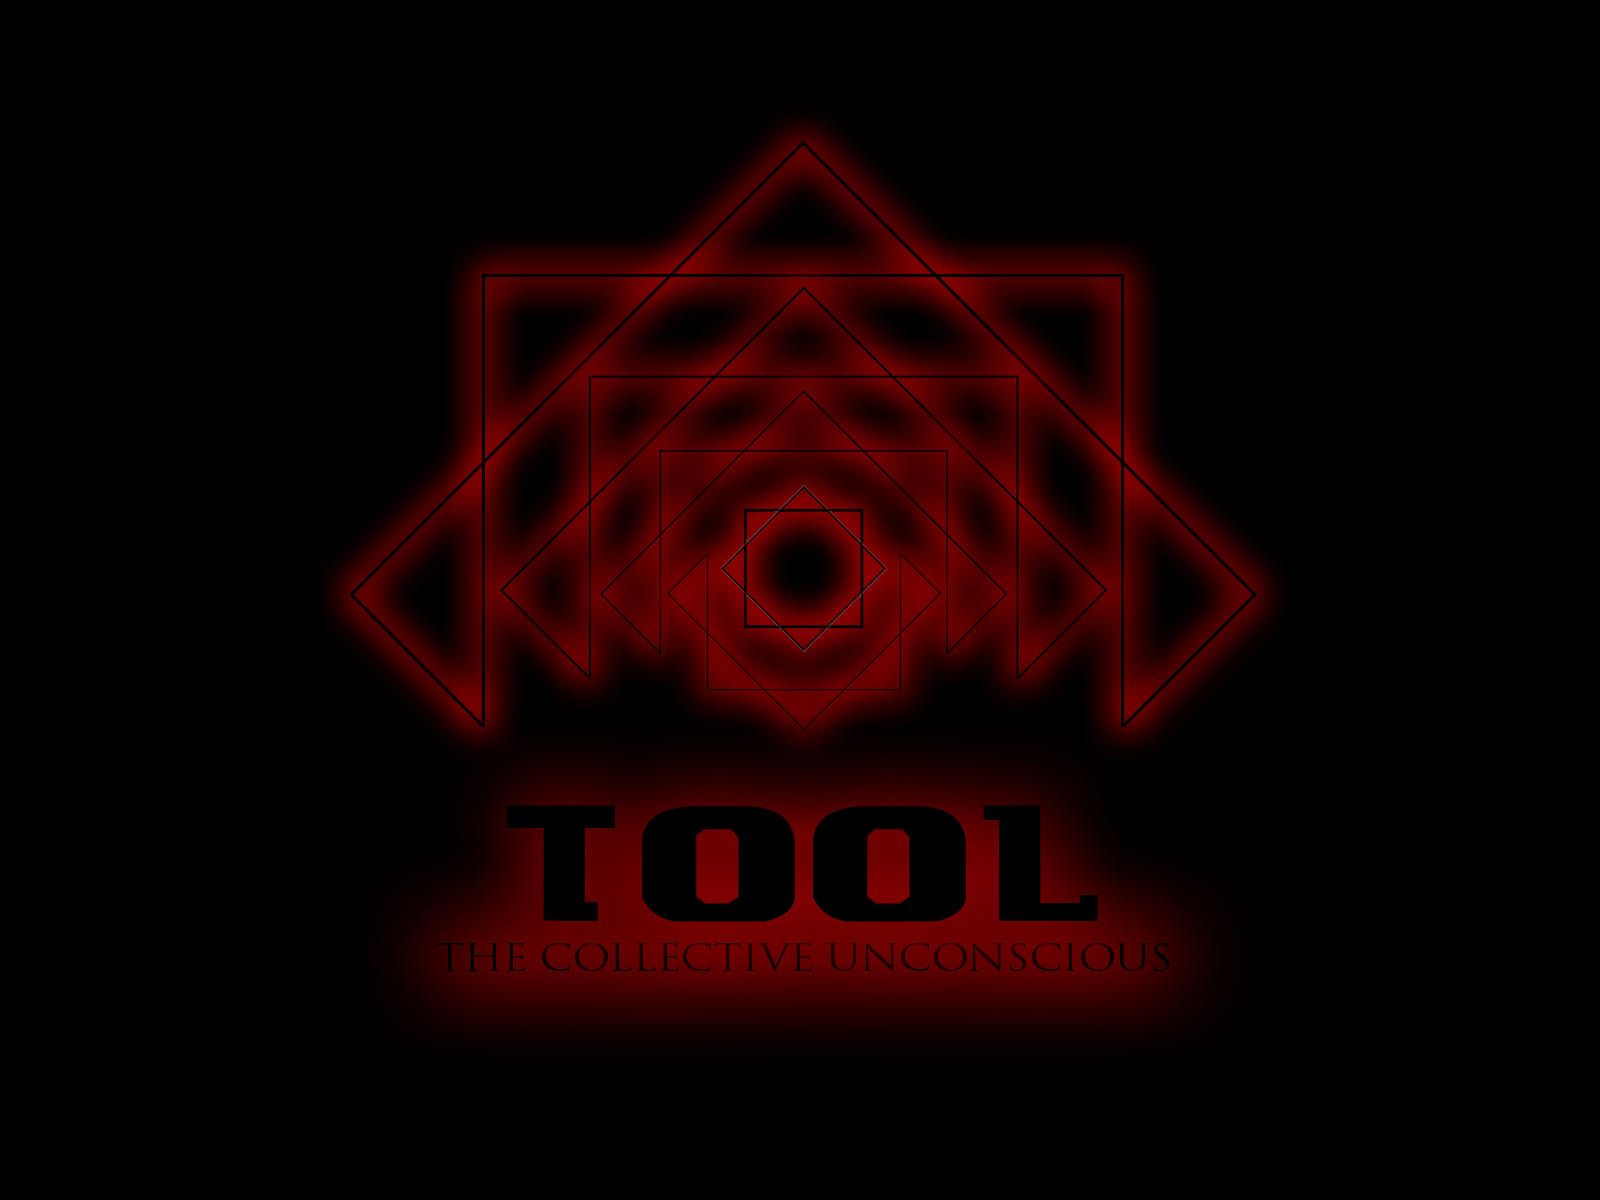 tool art wallpaper - photo #17